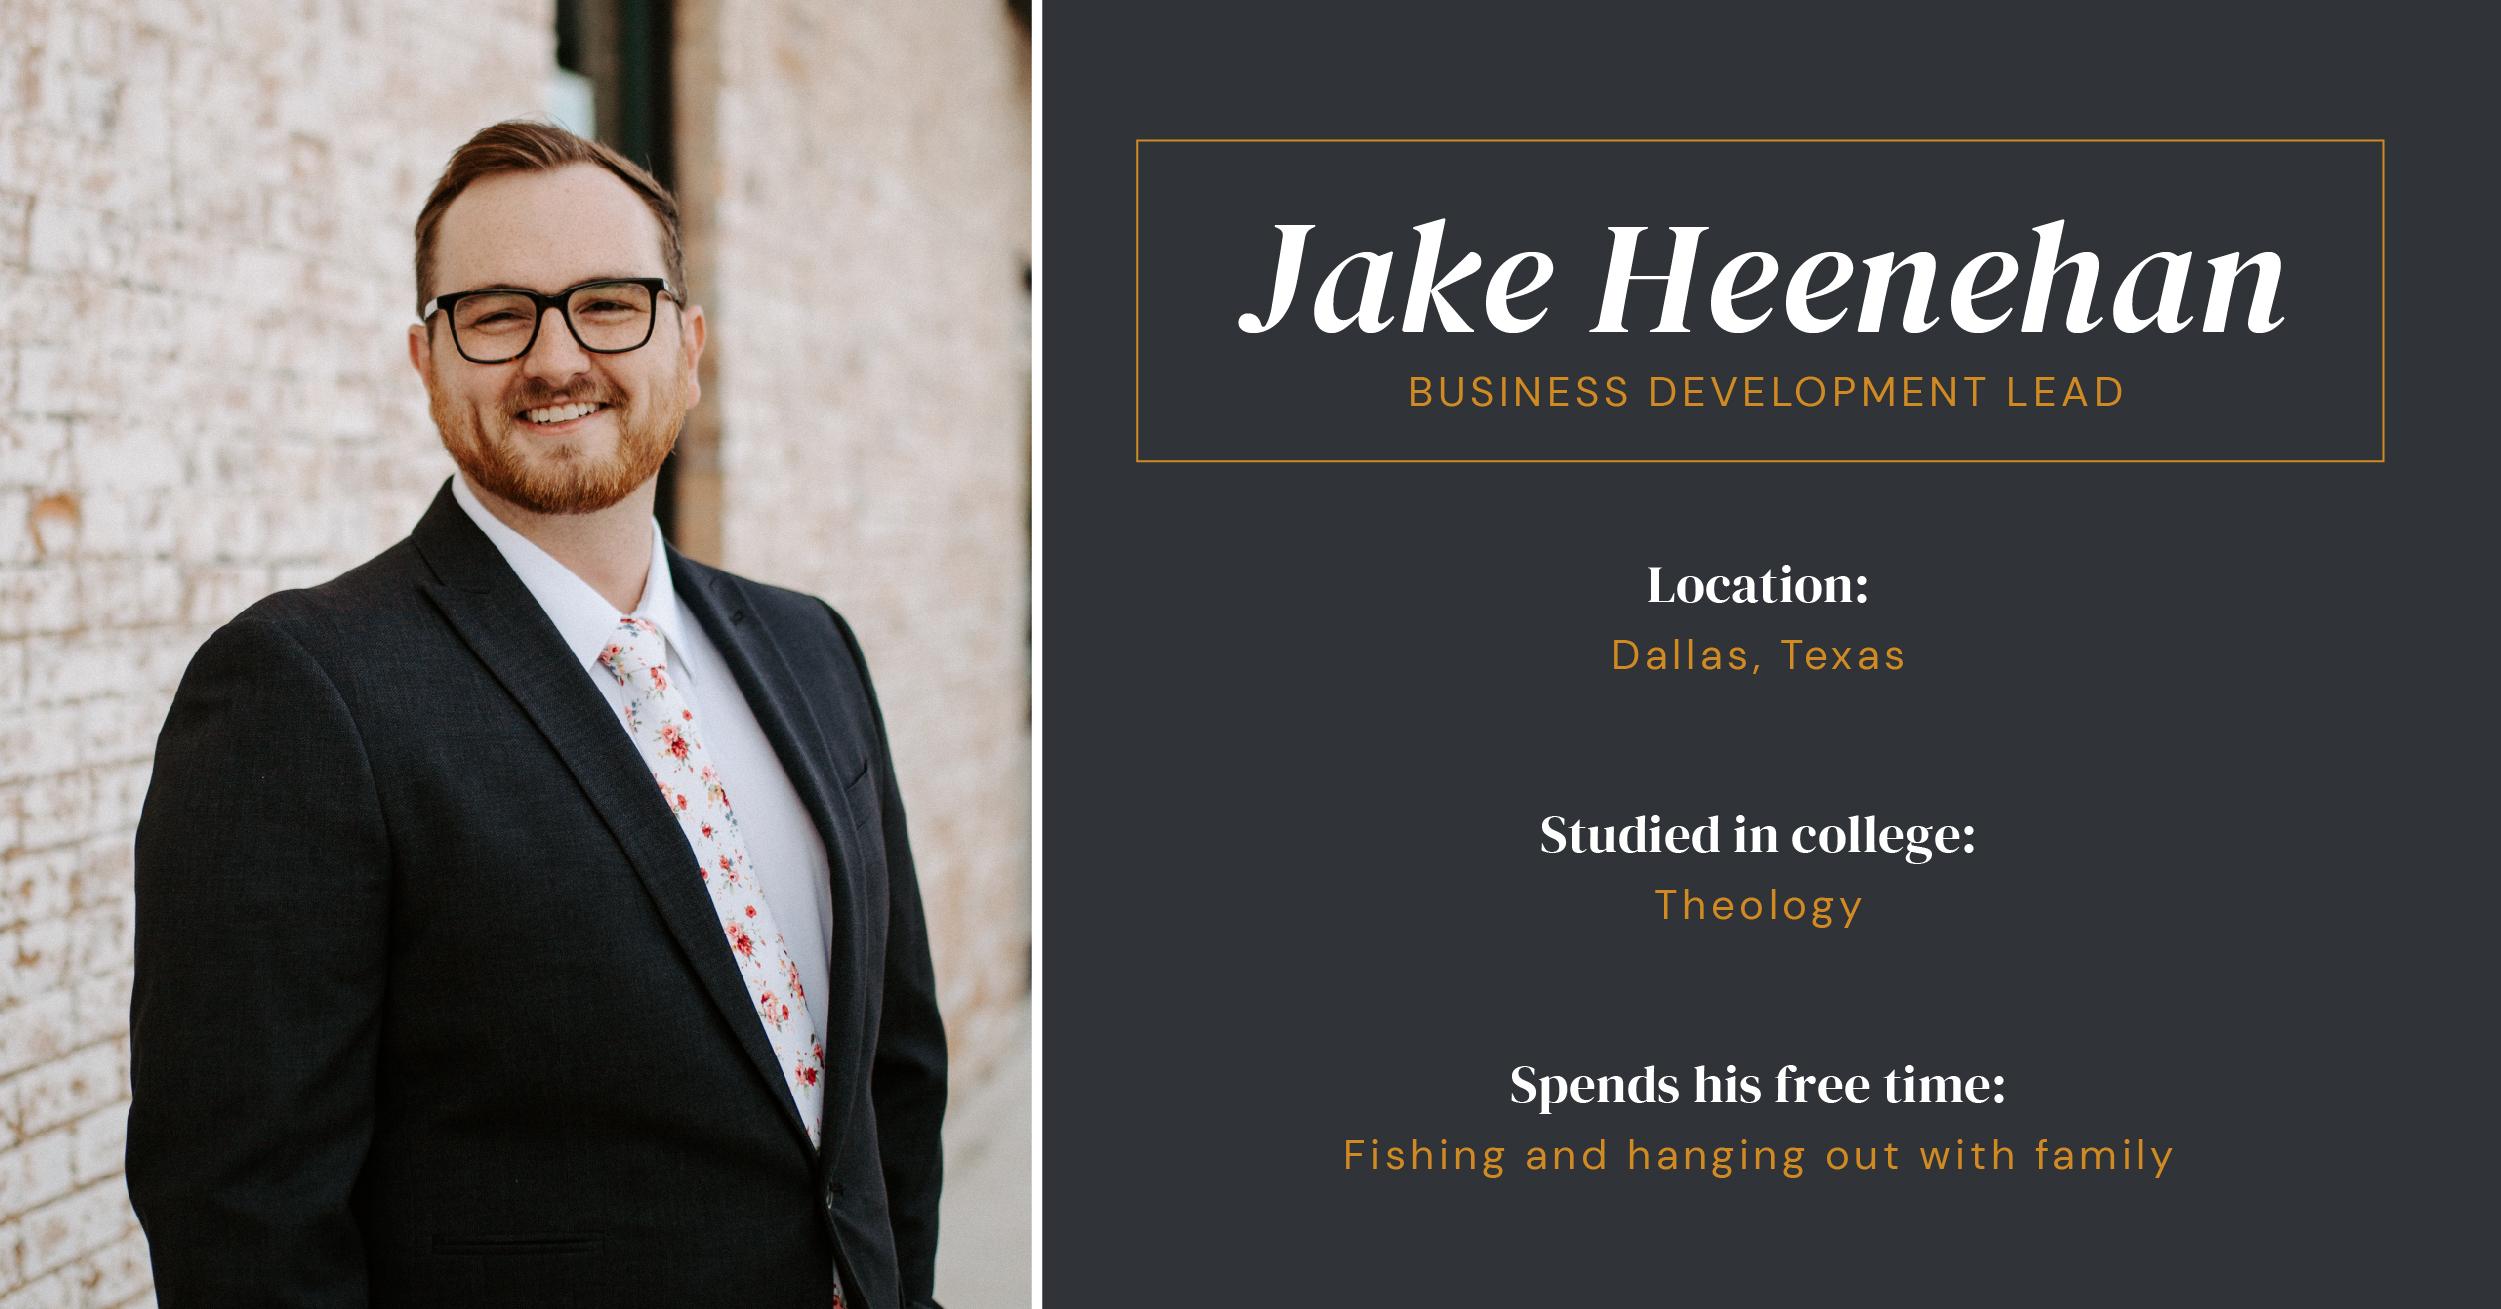 Jake Heenehan